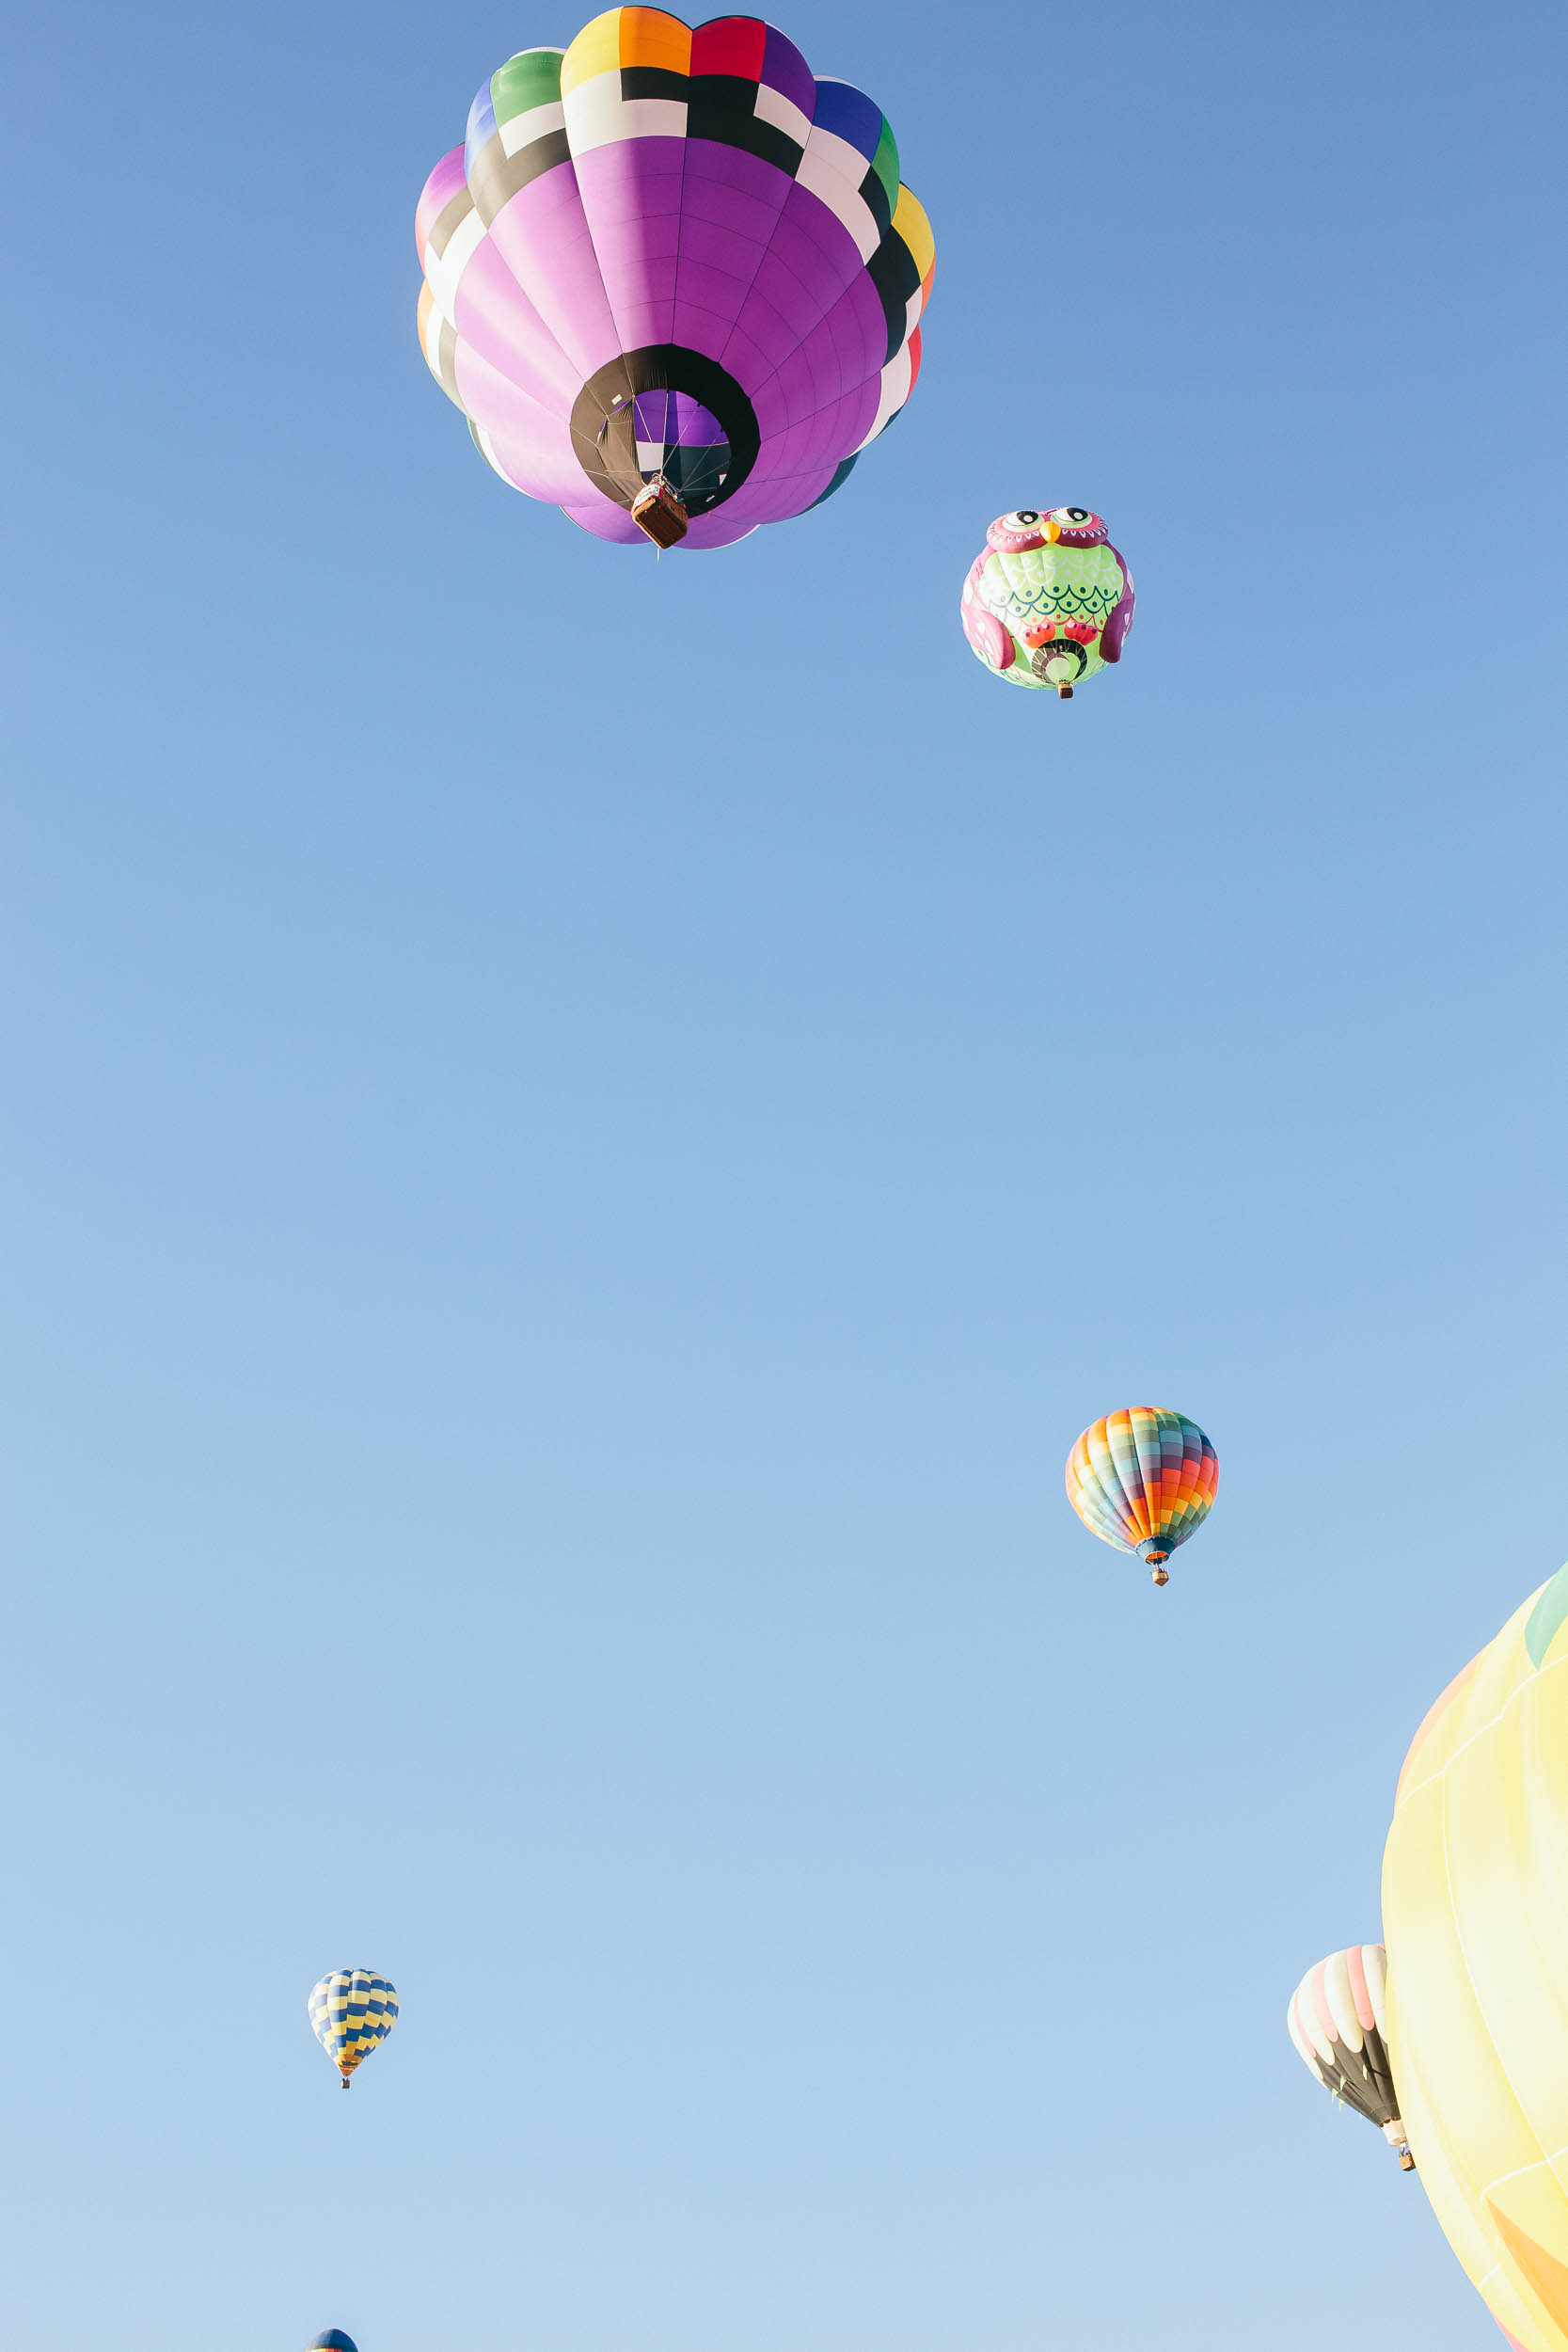 Kyle-Sheppard-Kanab-Balloon-Festival-16.jpg